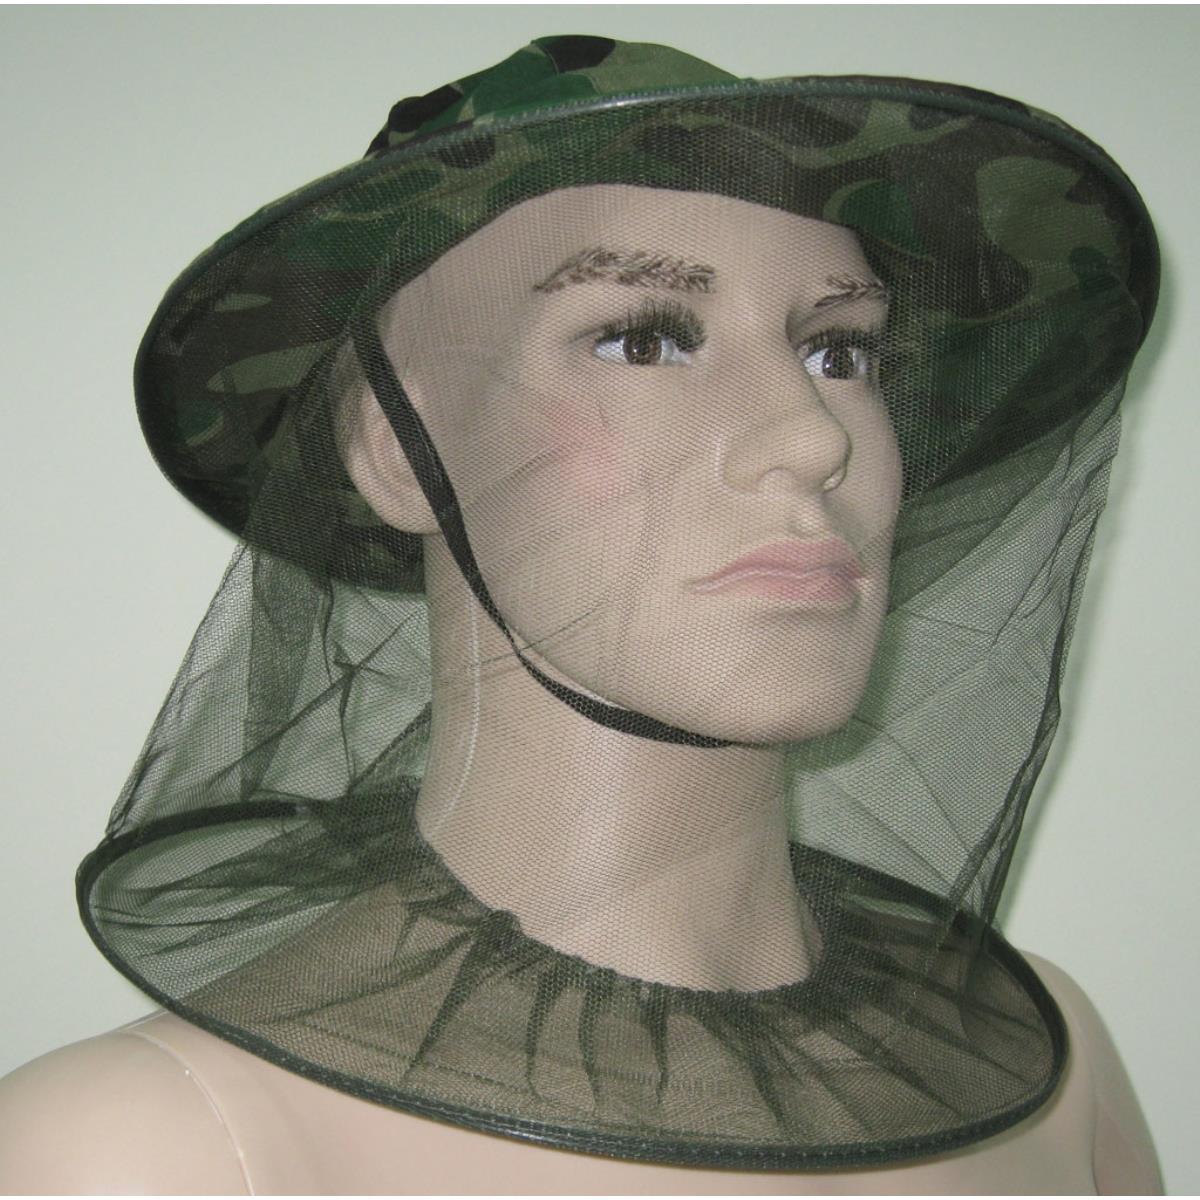 Mosquito Net Asia